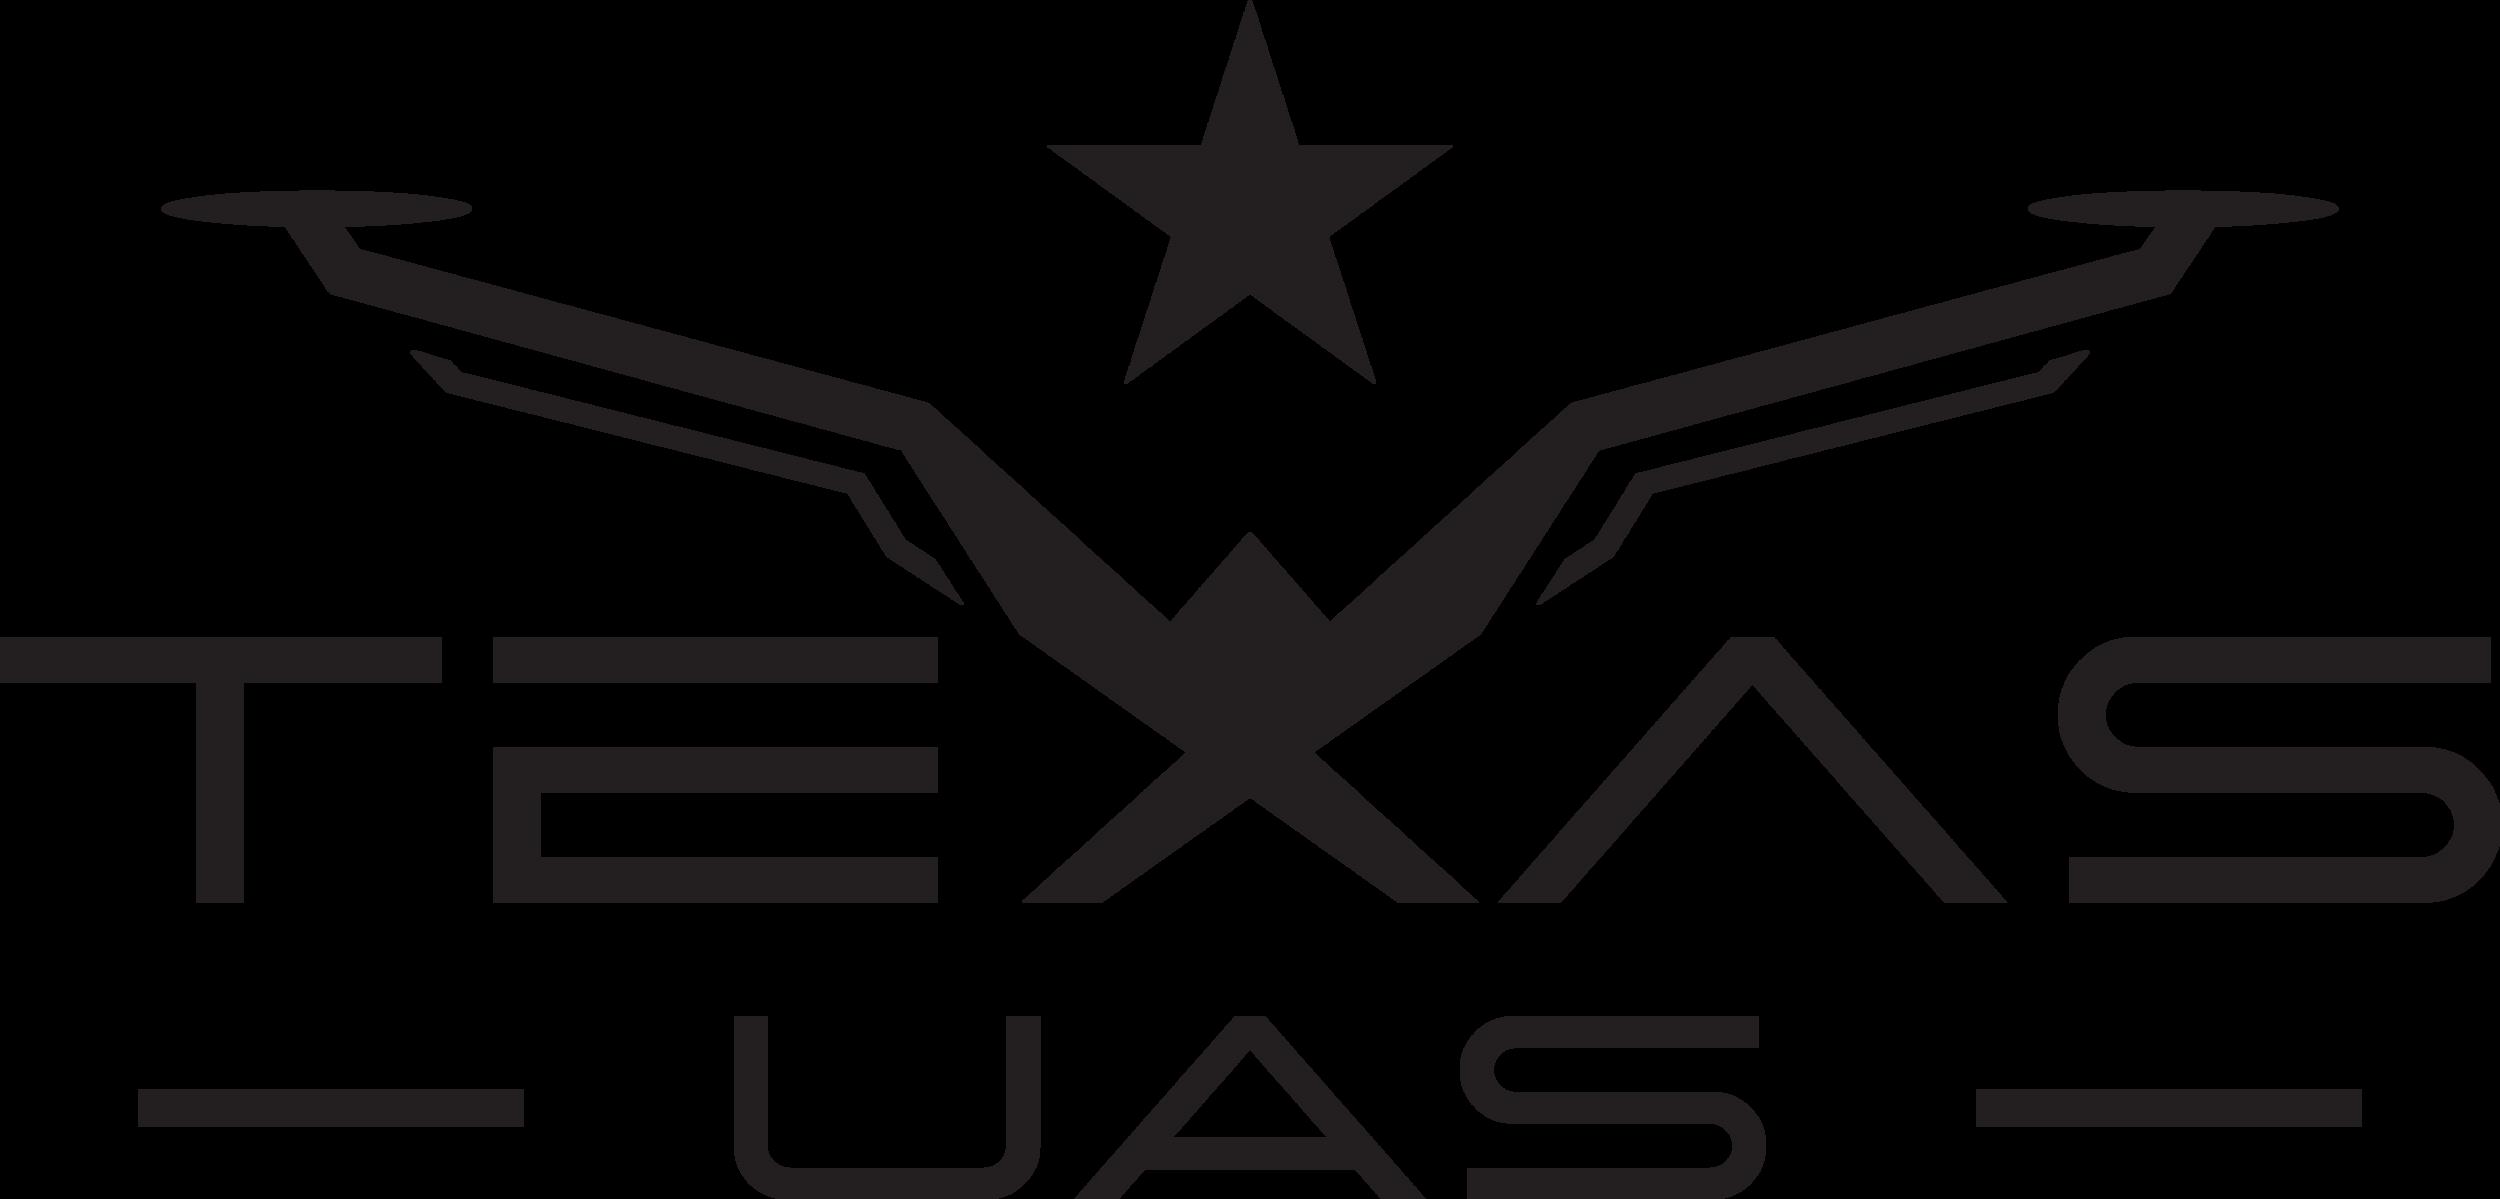 Texas-Uas-Logo-Transparant-Black (1).png